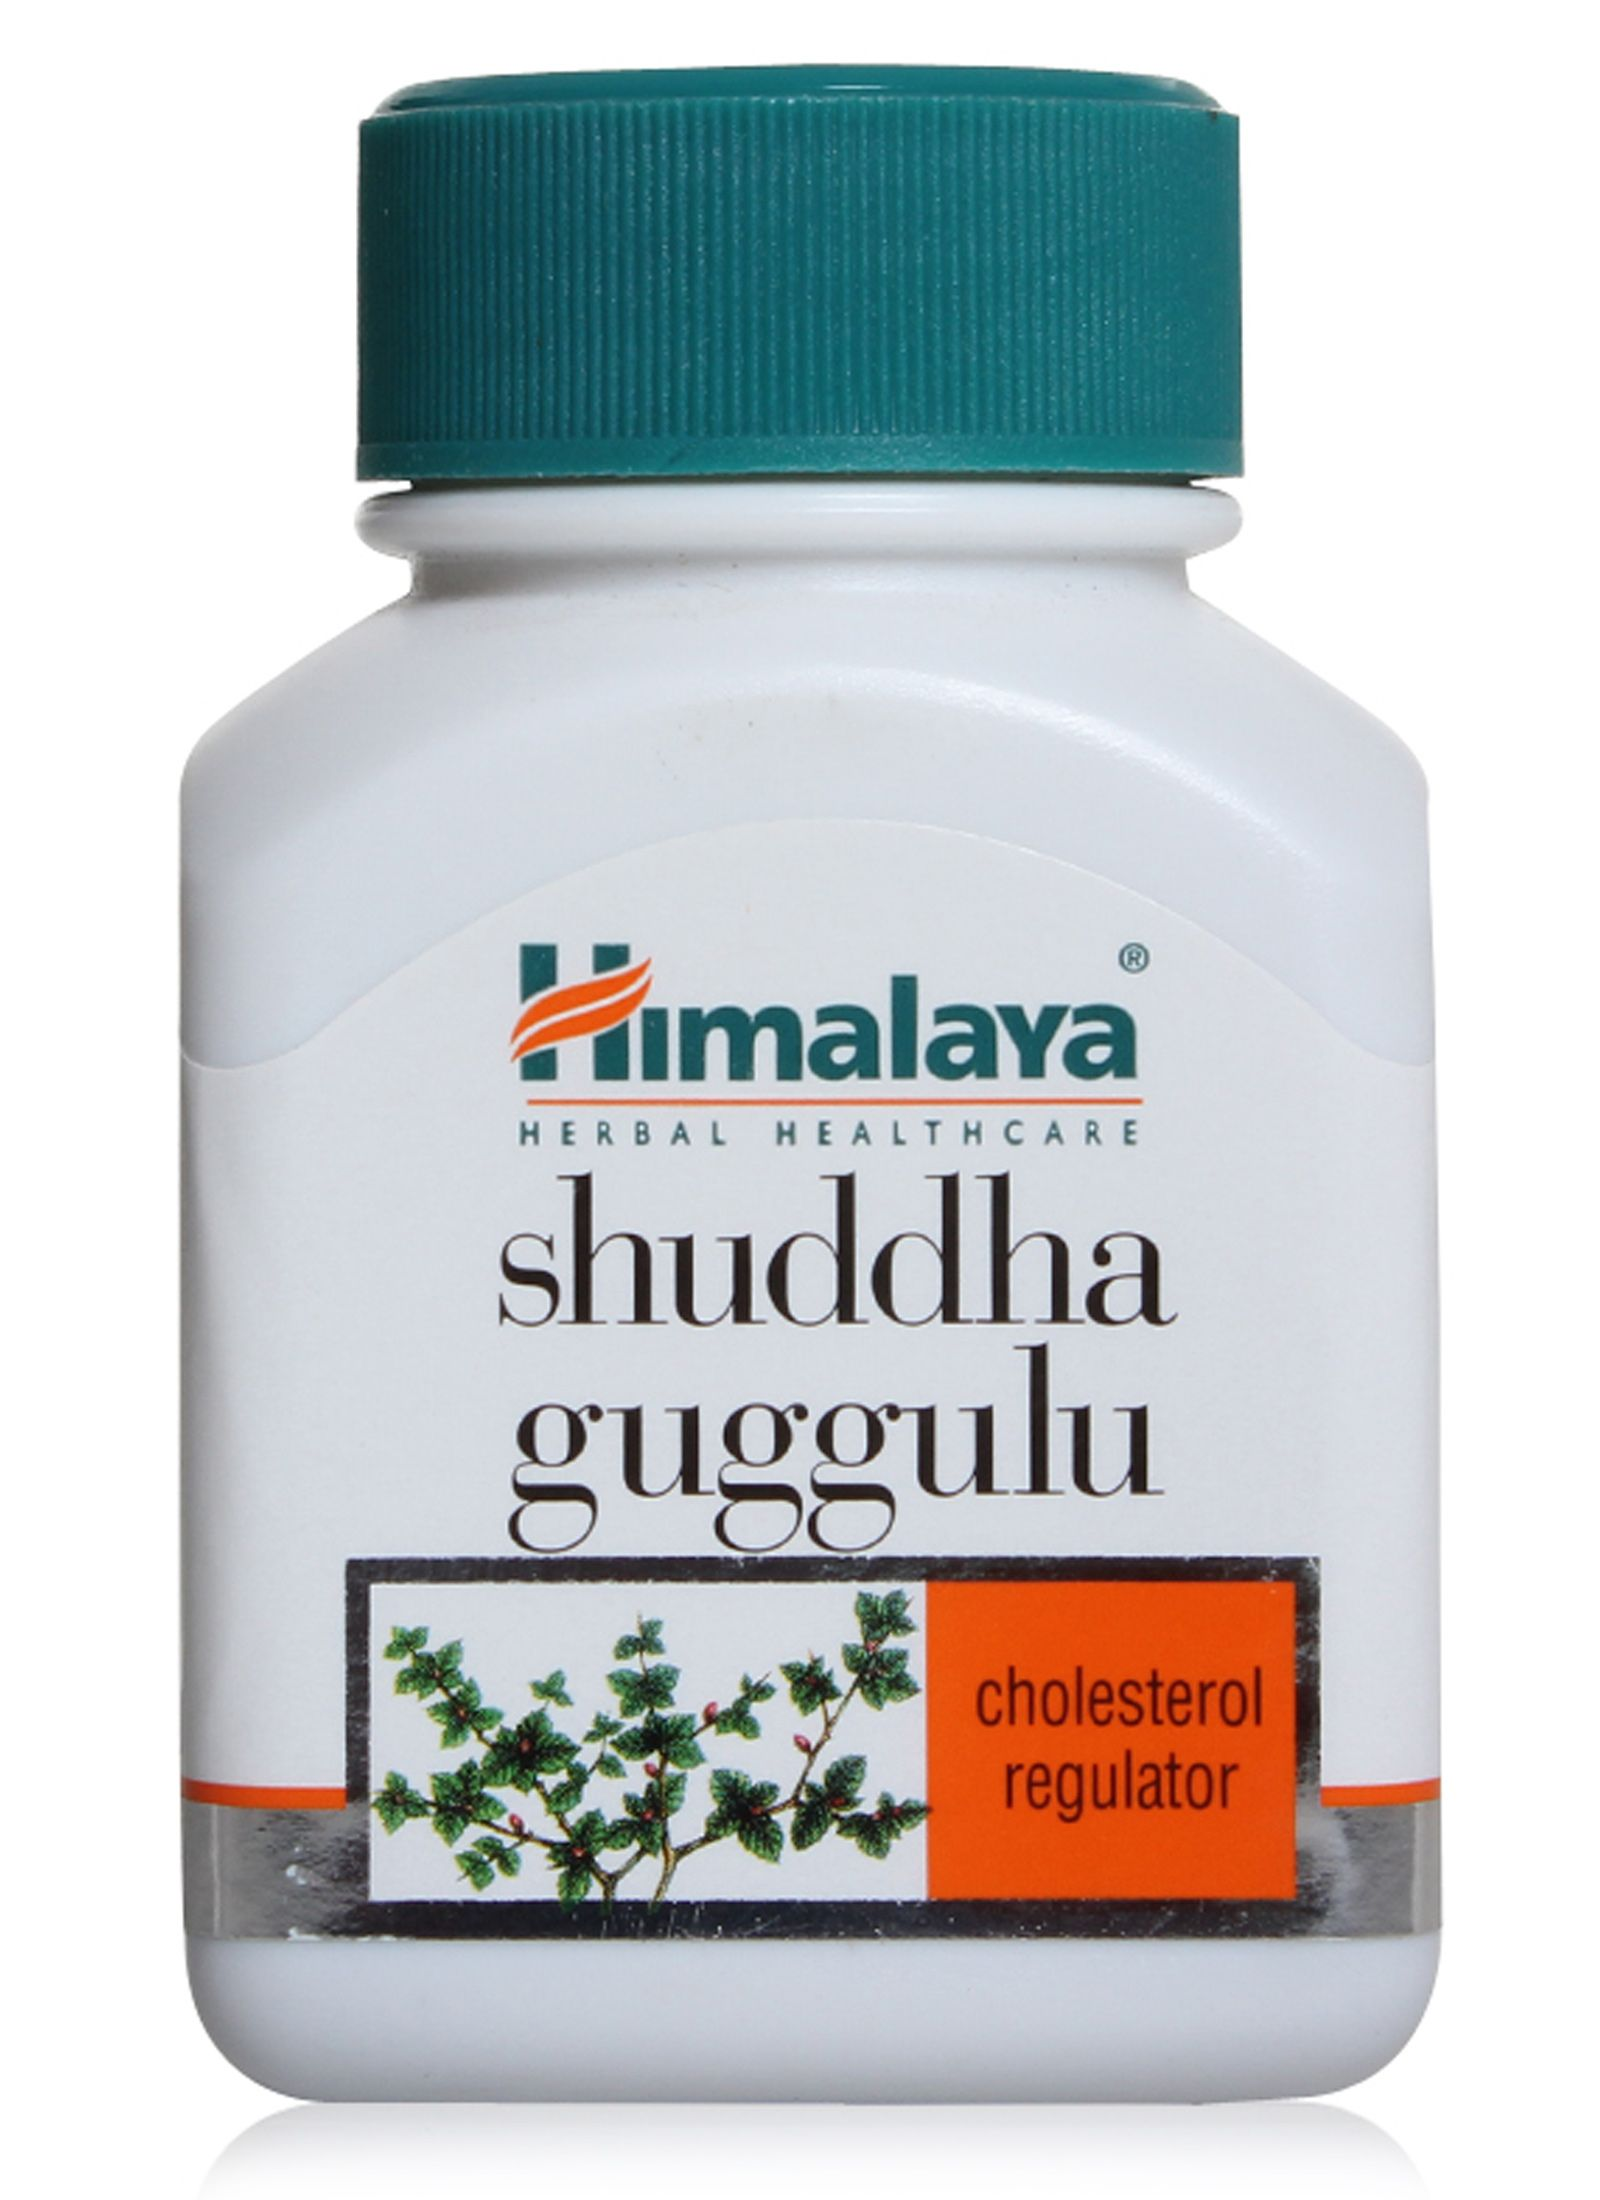 Himalaya Shuddha Guggulu Price